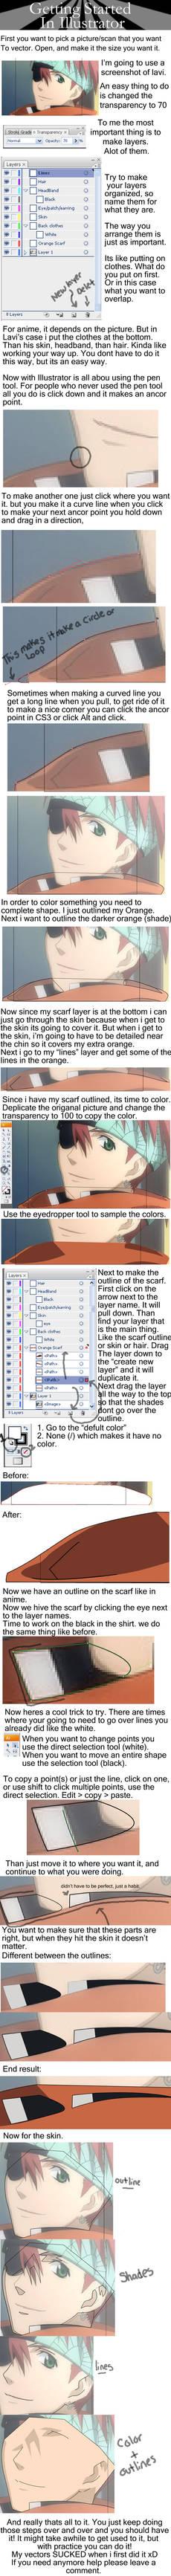 Adobe Illustrator Tutoral